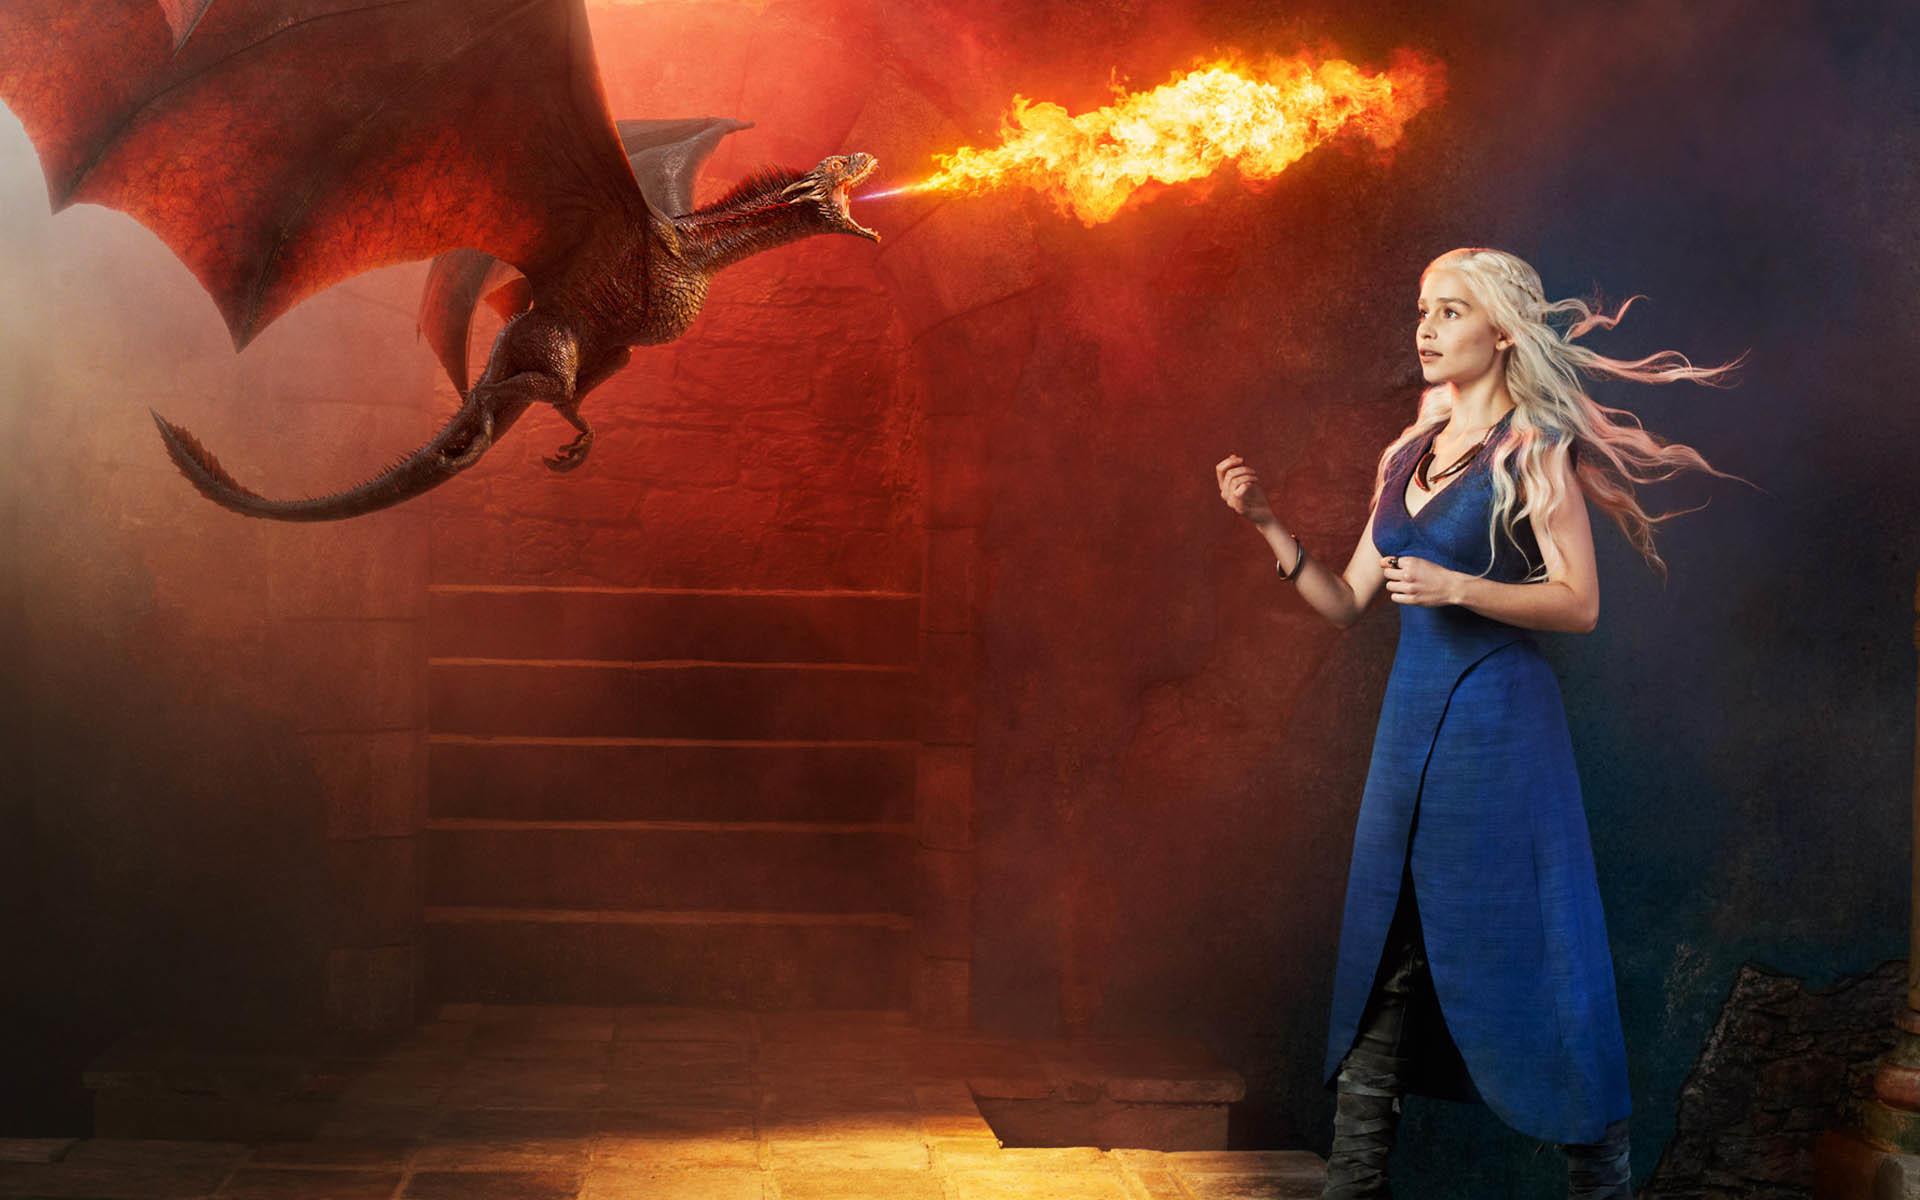 Daenerys Targaryen Mother of Dragons wallpaper